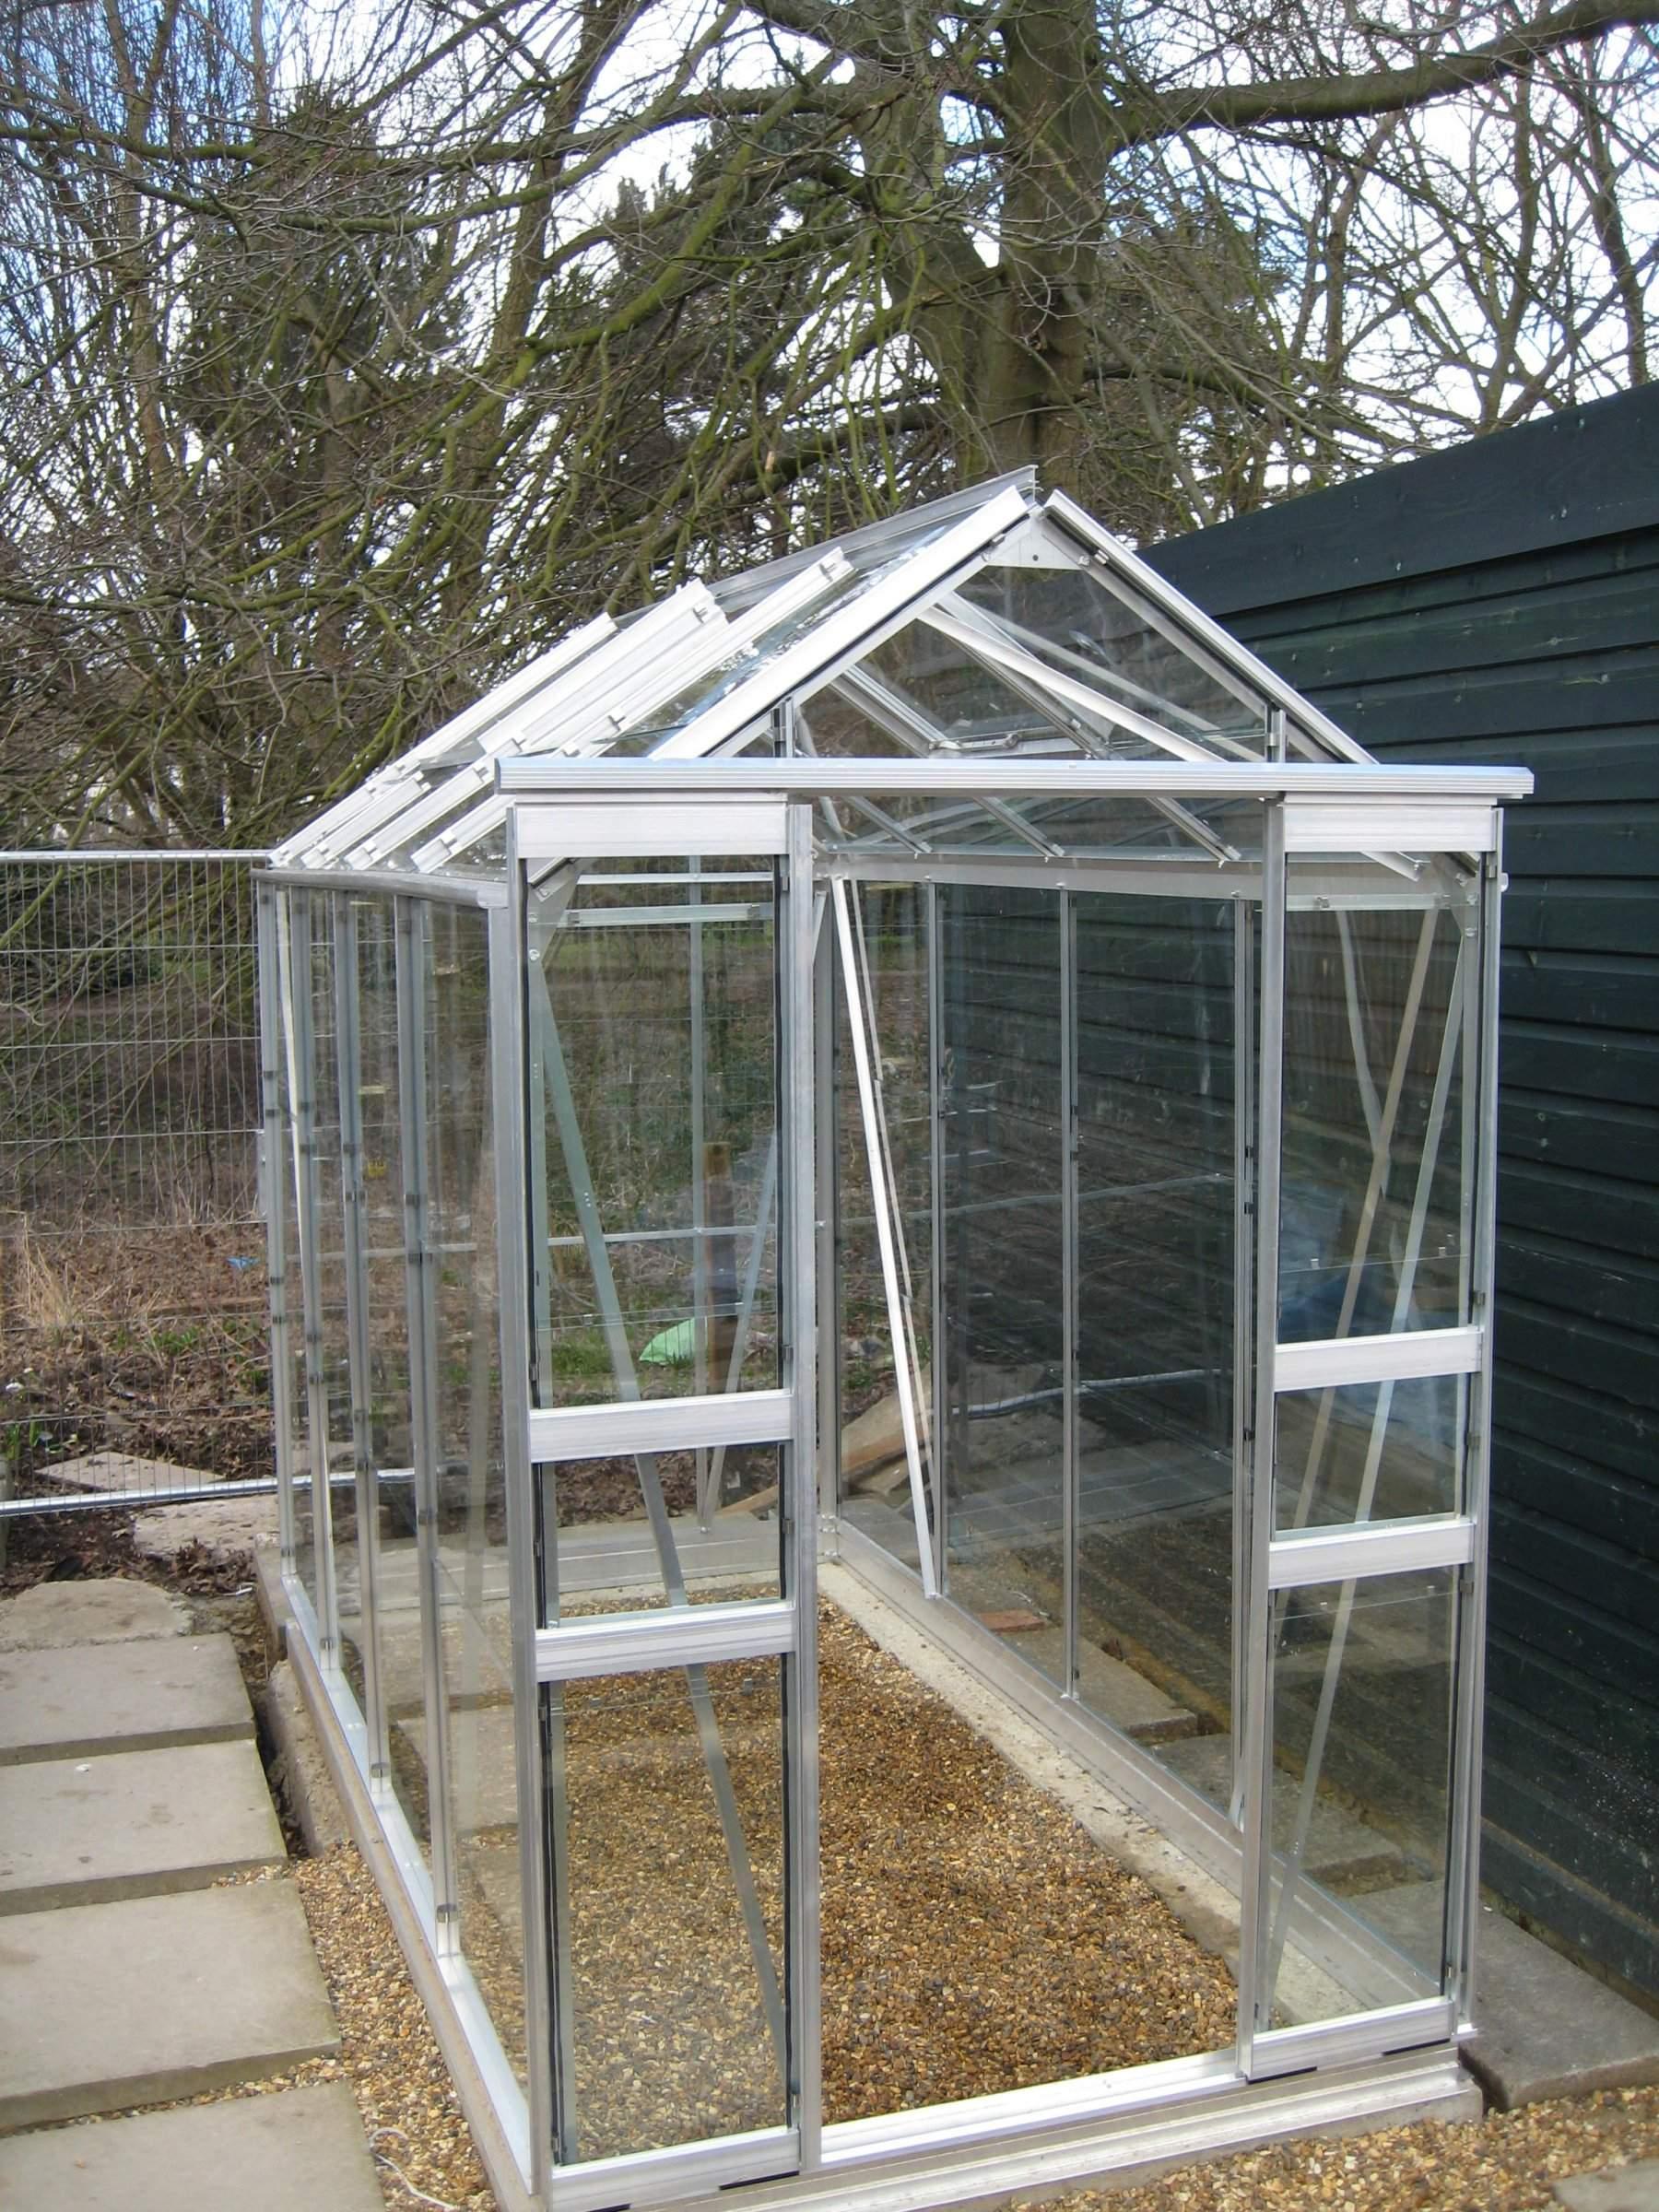 Simplicity Sandon 4x8 **Starter package** greenhouse on 10x14 greenhouse, 10x16 greenhouse, 5x8 greenhouse, 4 x 4 greenhouse, 3x3 greenhouse, 10x8 greenhouse, 8x8 greenhouse, 8x6 greenhouse, 10x30 greenhouse, 14x14 greenhouse, 30x60 greenhouse, 5x5 greenhouse, 6x12 greenhouse, 12x24 greenhouse, 9x12 greenhouse, 6x4 greenhouse, 2x4 greenhouse, 8x16 greenhouse, 4x10 greenhouse, 8x9 greenhouse,